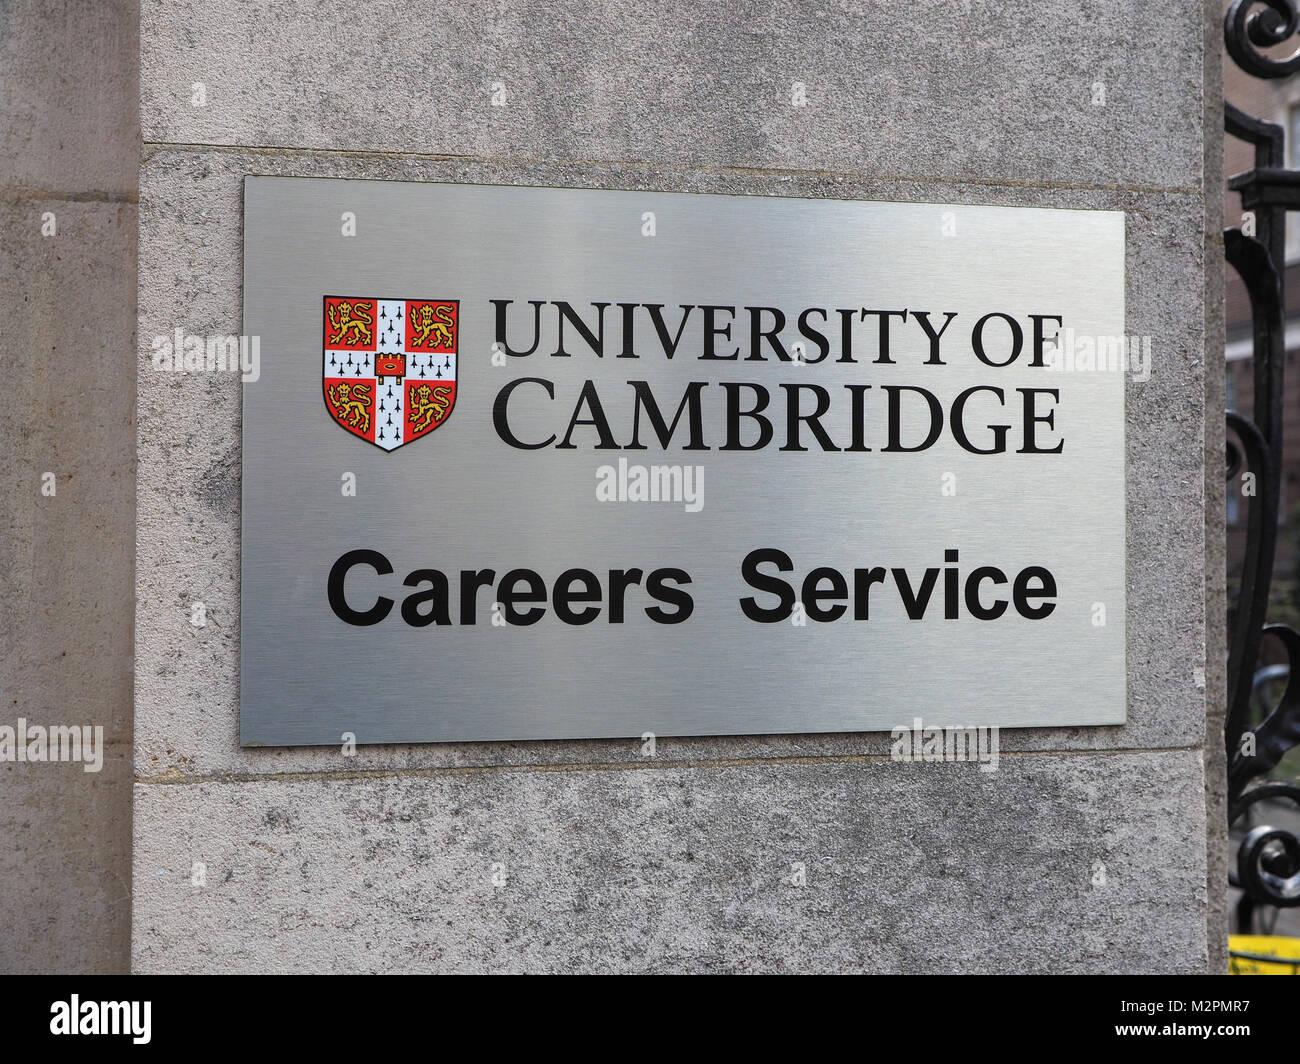 University of Cambridge Careers Service sign Stock Photo